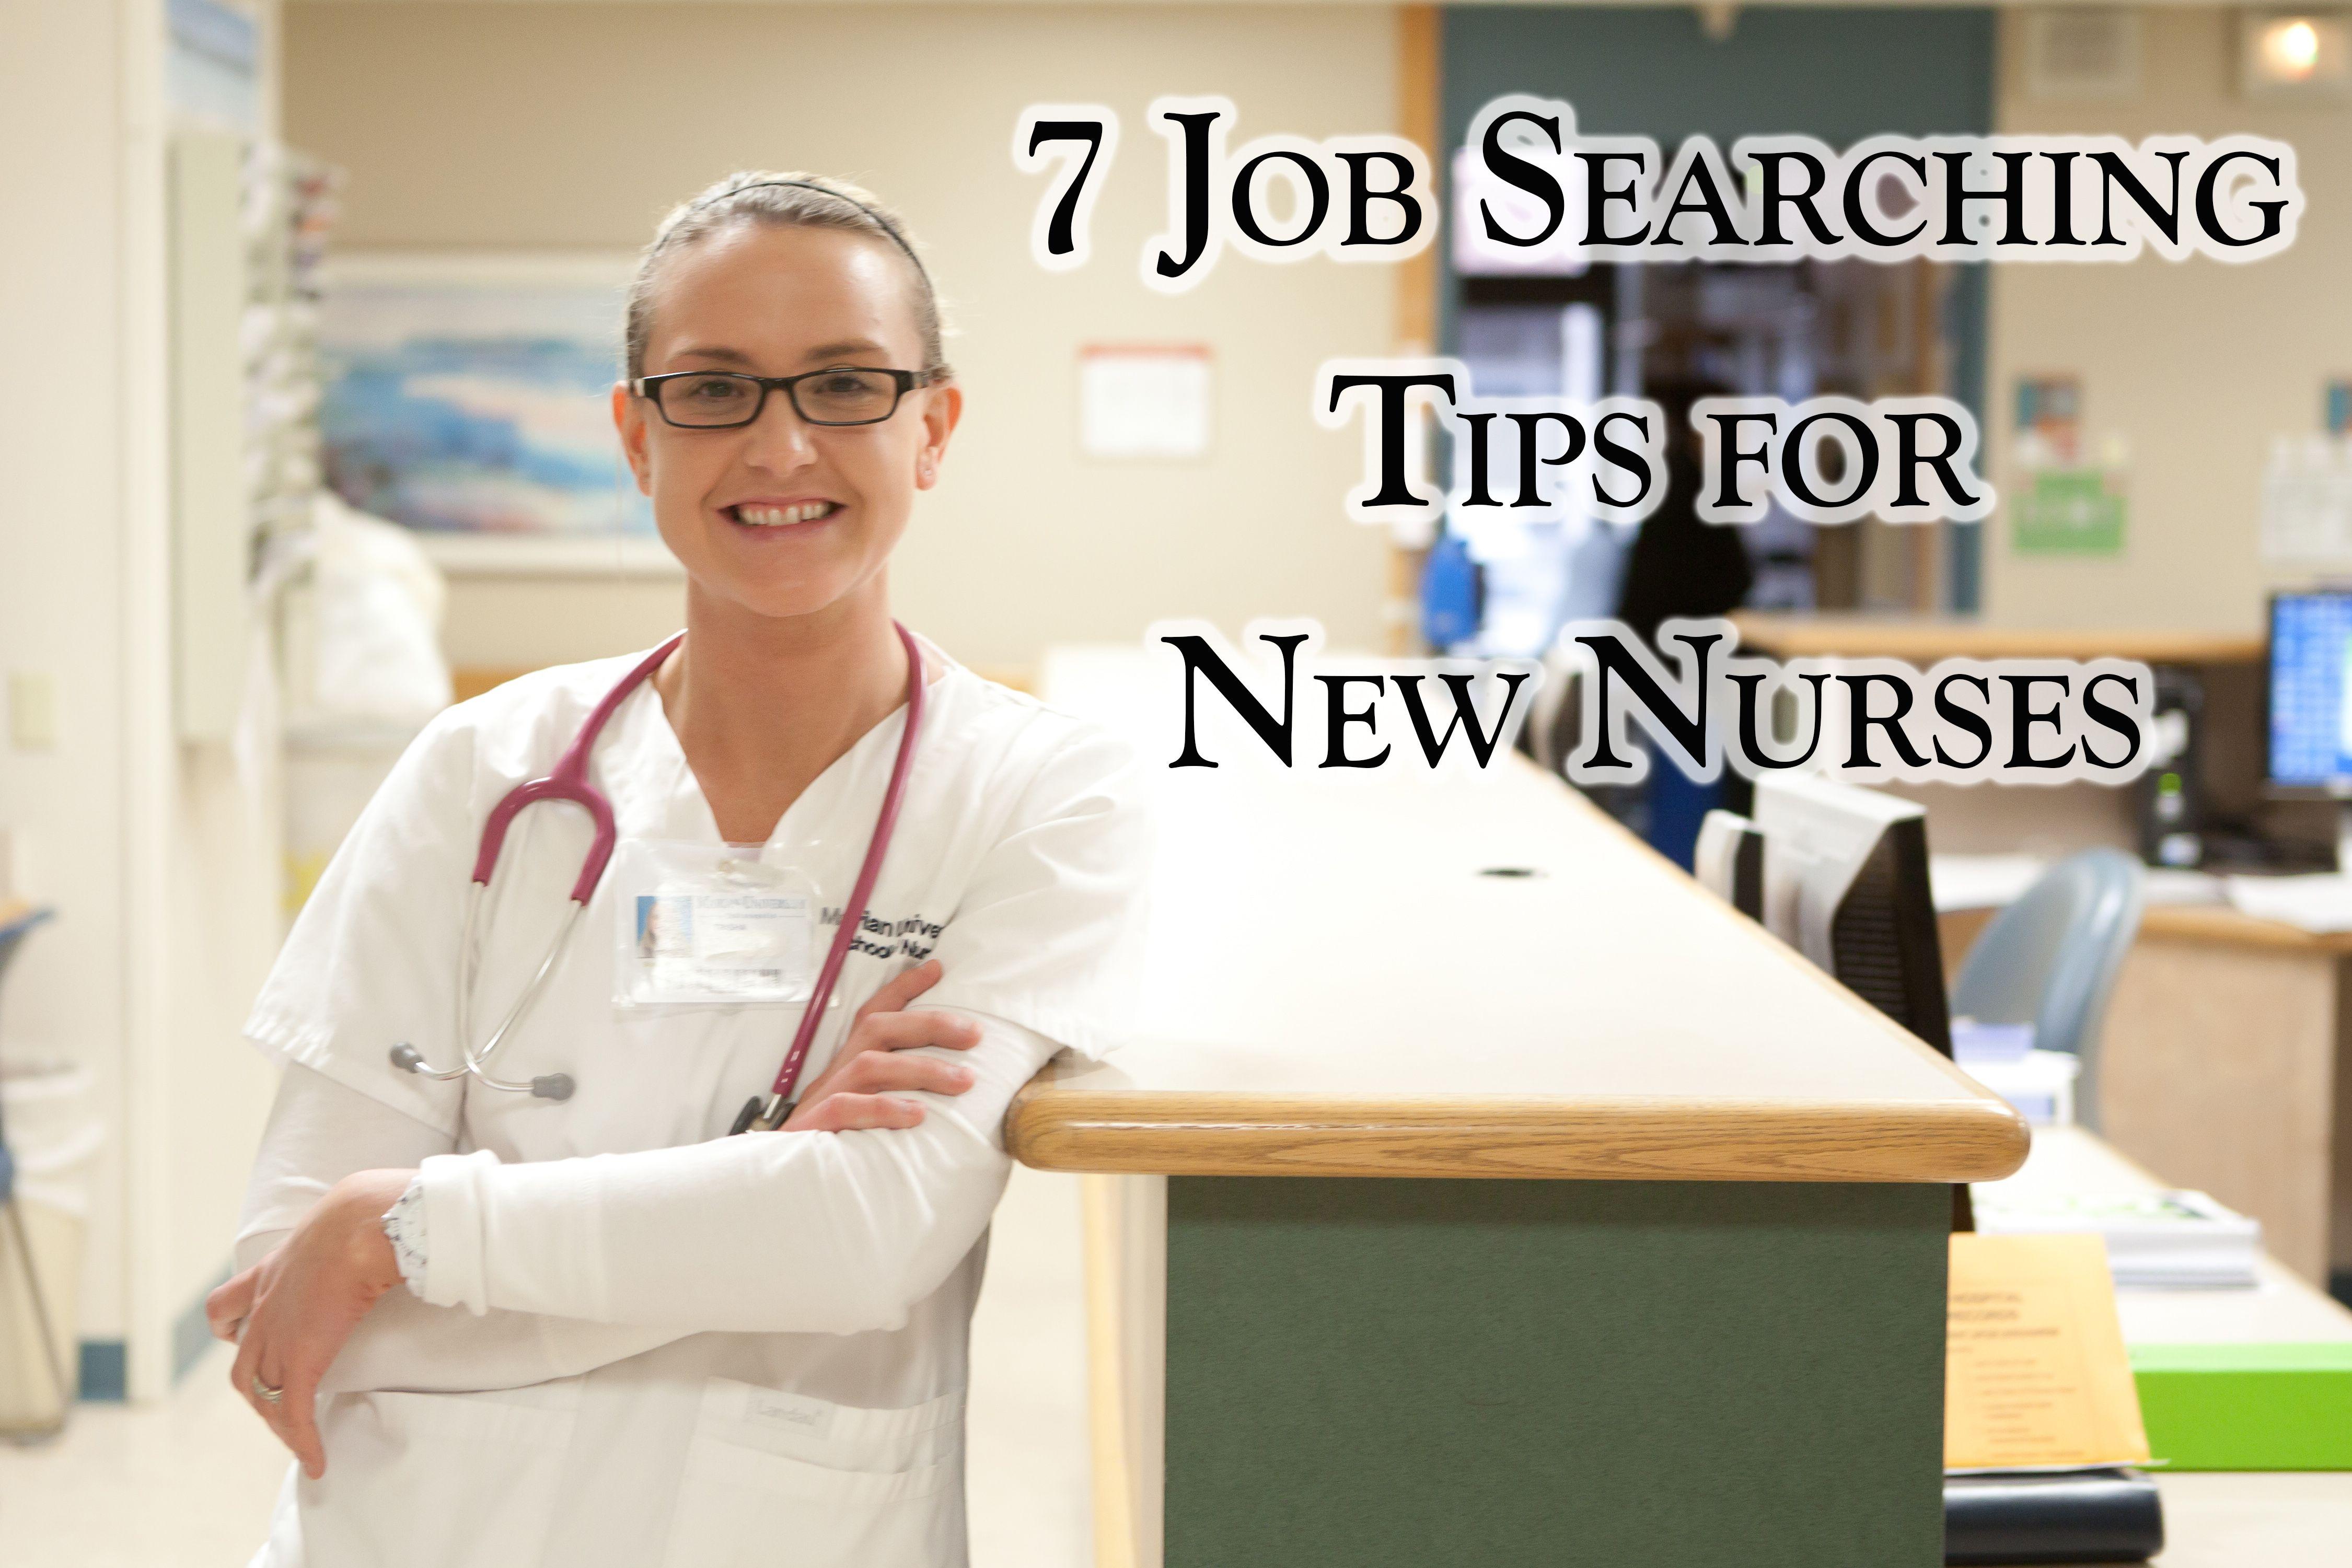 7 job searching tips for new nurses new nurse nursing